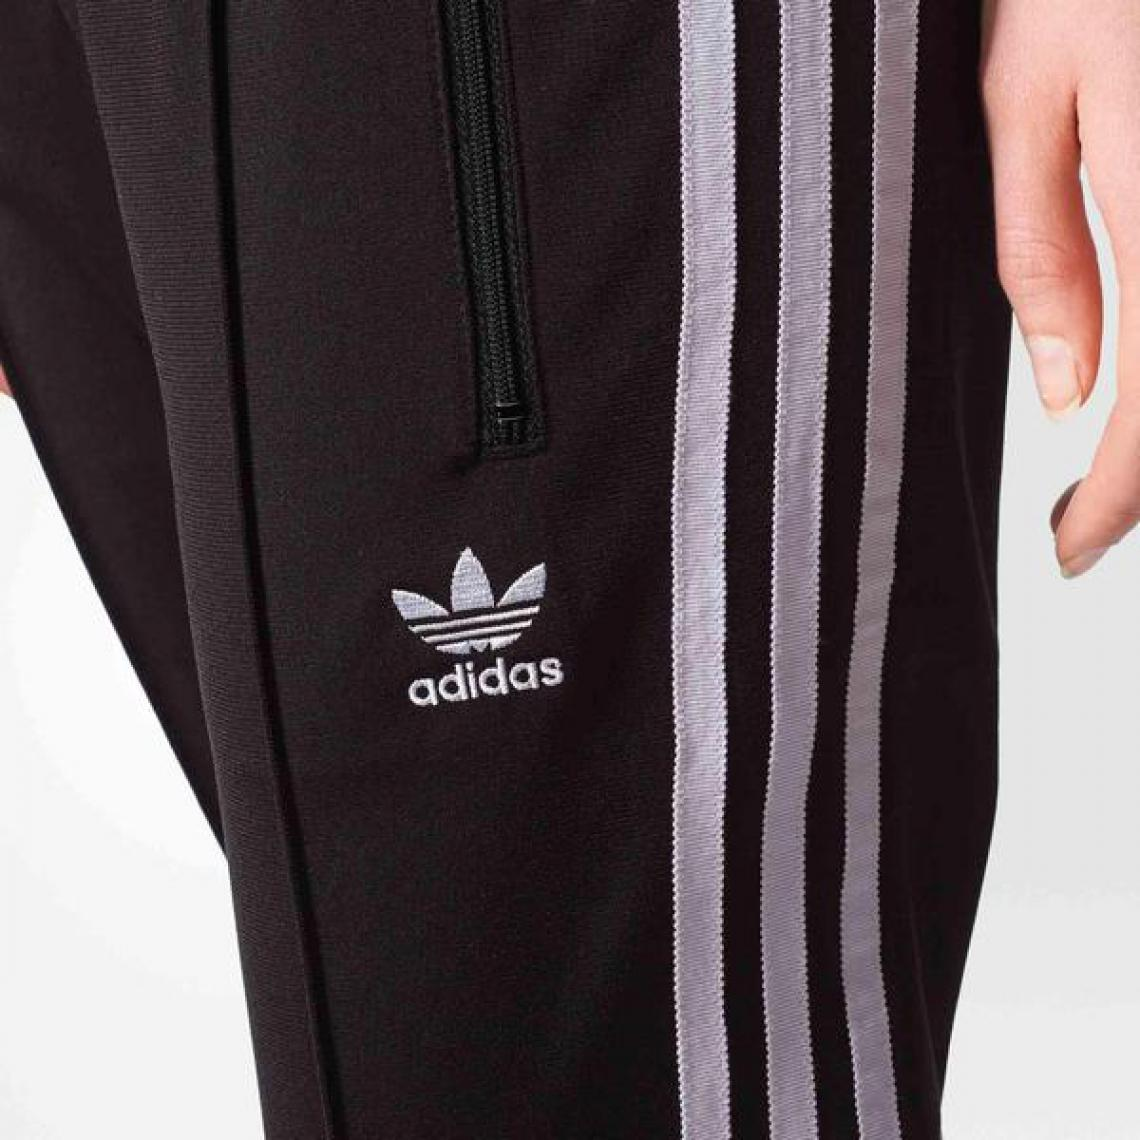 Pantalon jogging 3 bandes Adidas Originals femme Noir 1 Avis